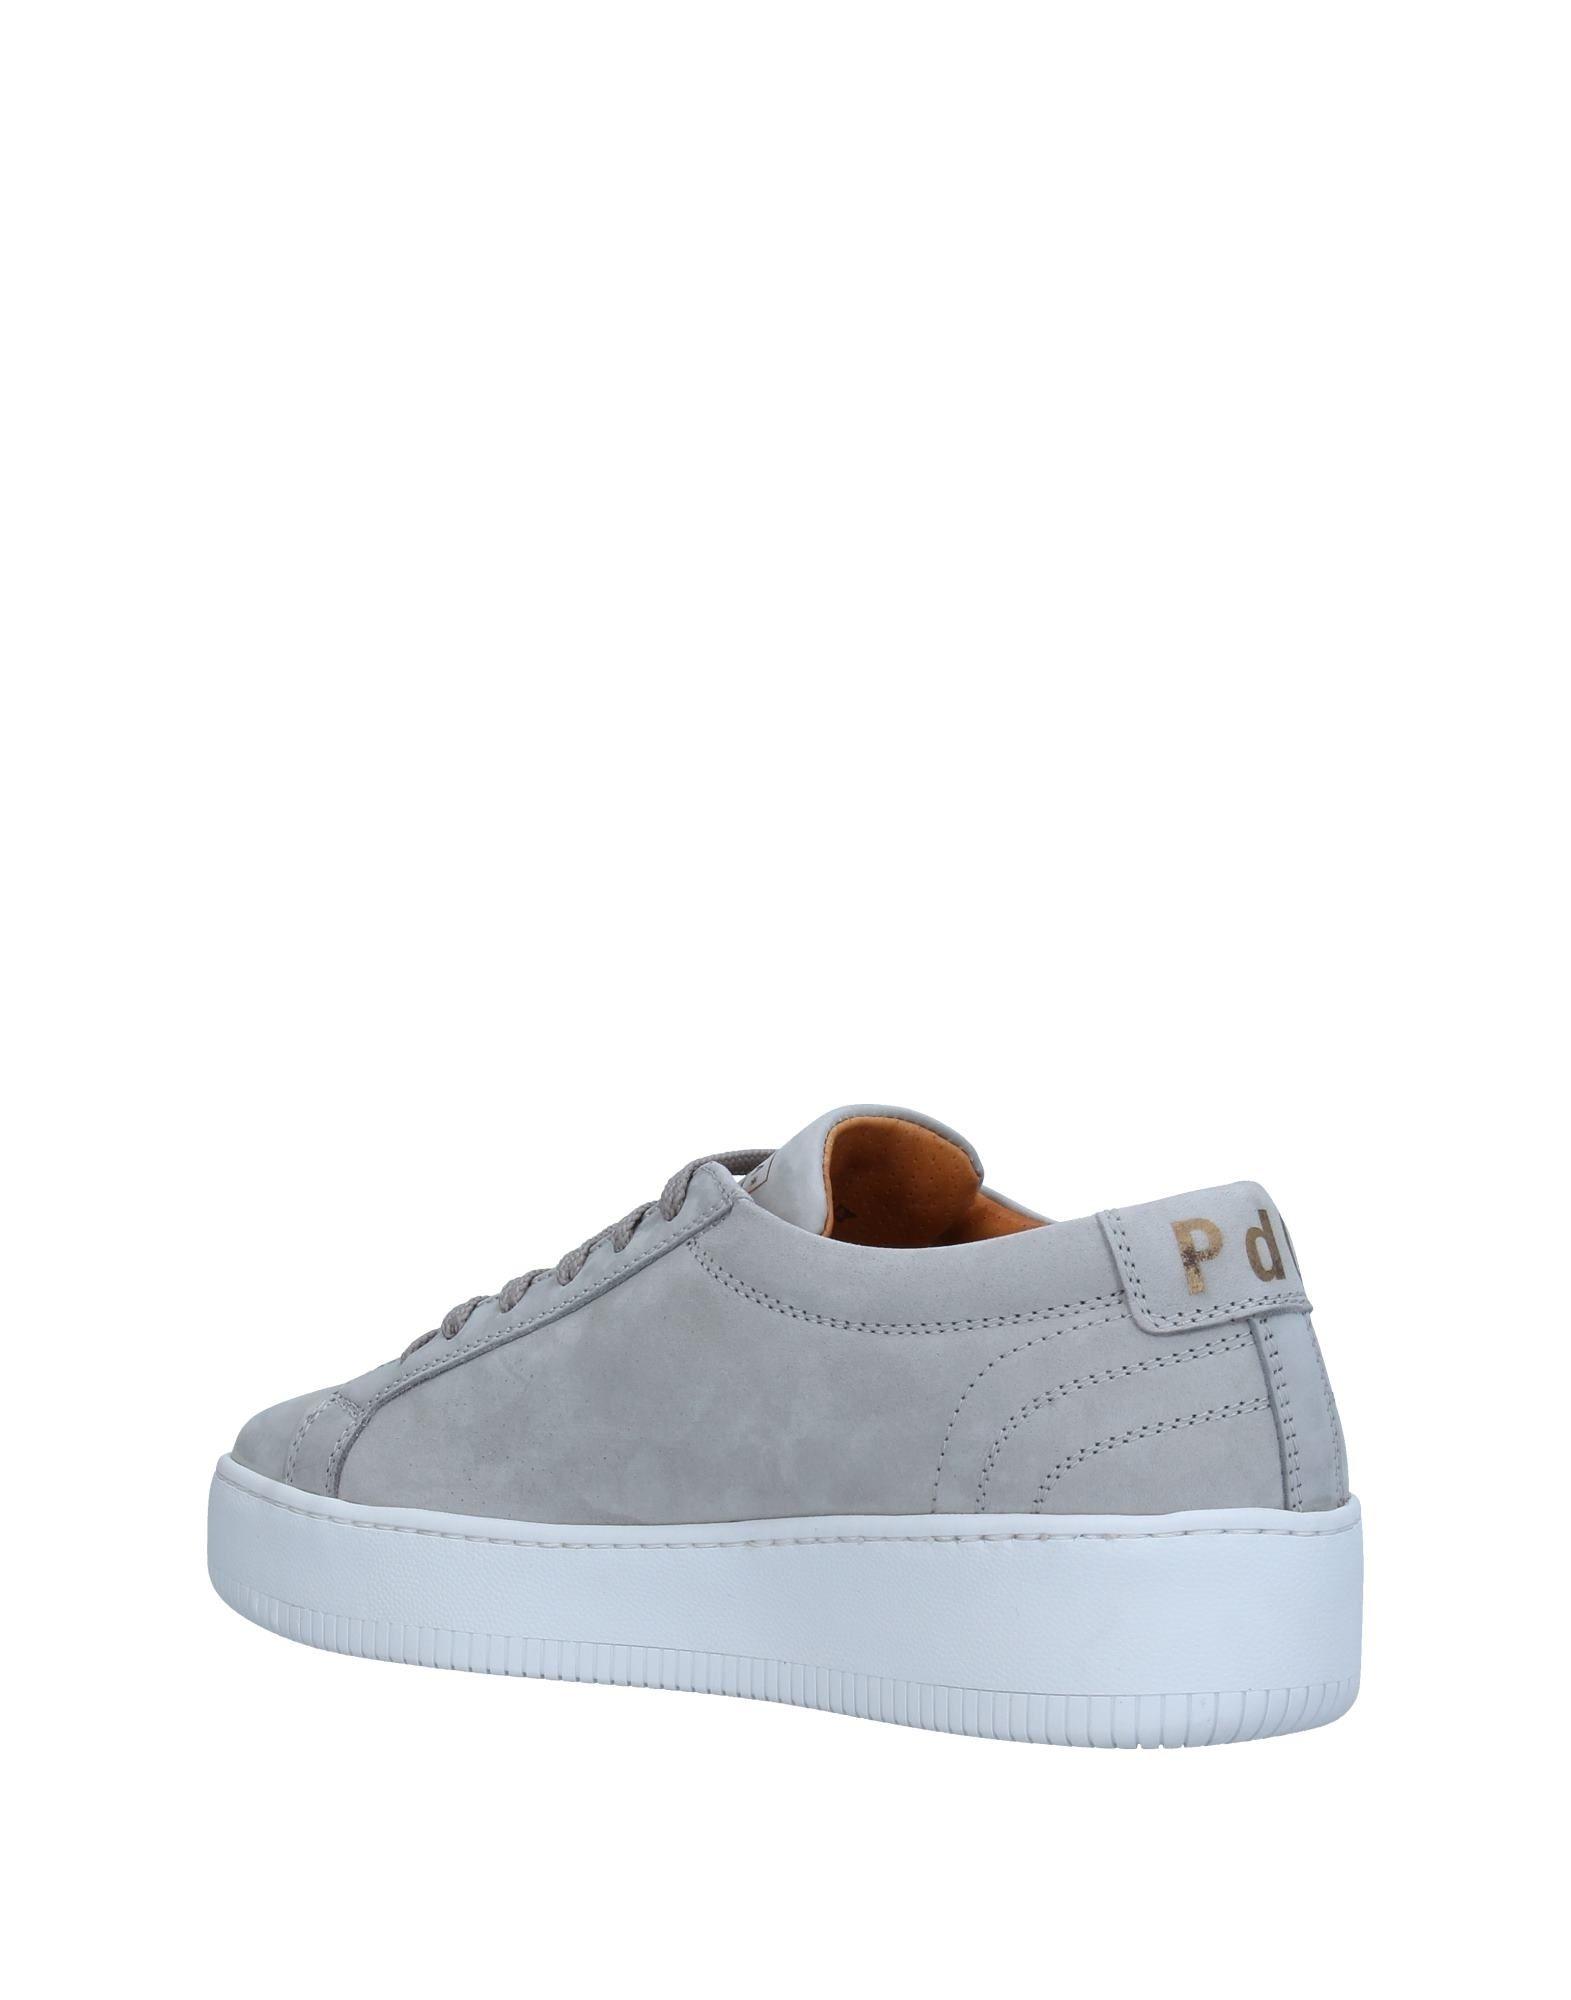 Sneakers Pantofola Pantofola Sneakers D'oro Donna - 11339691NO 385000